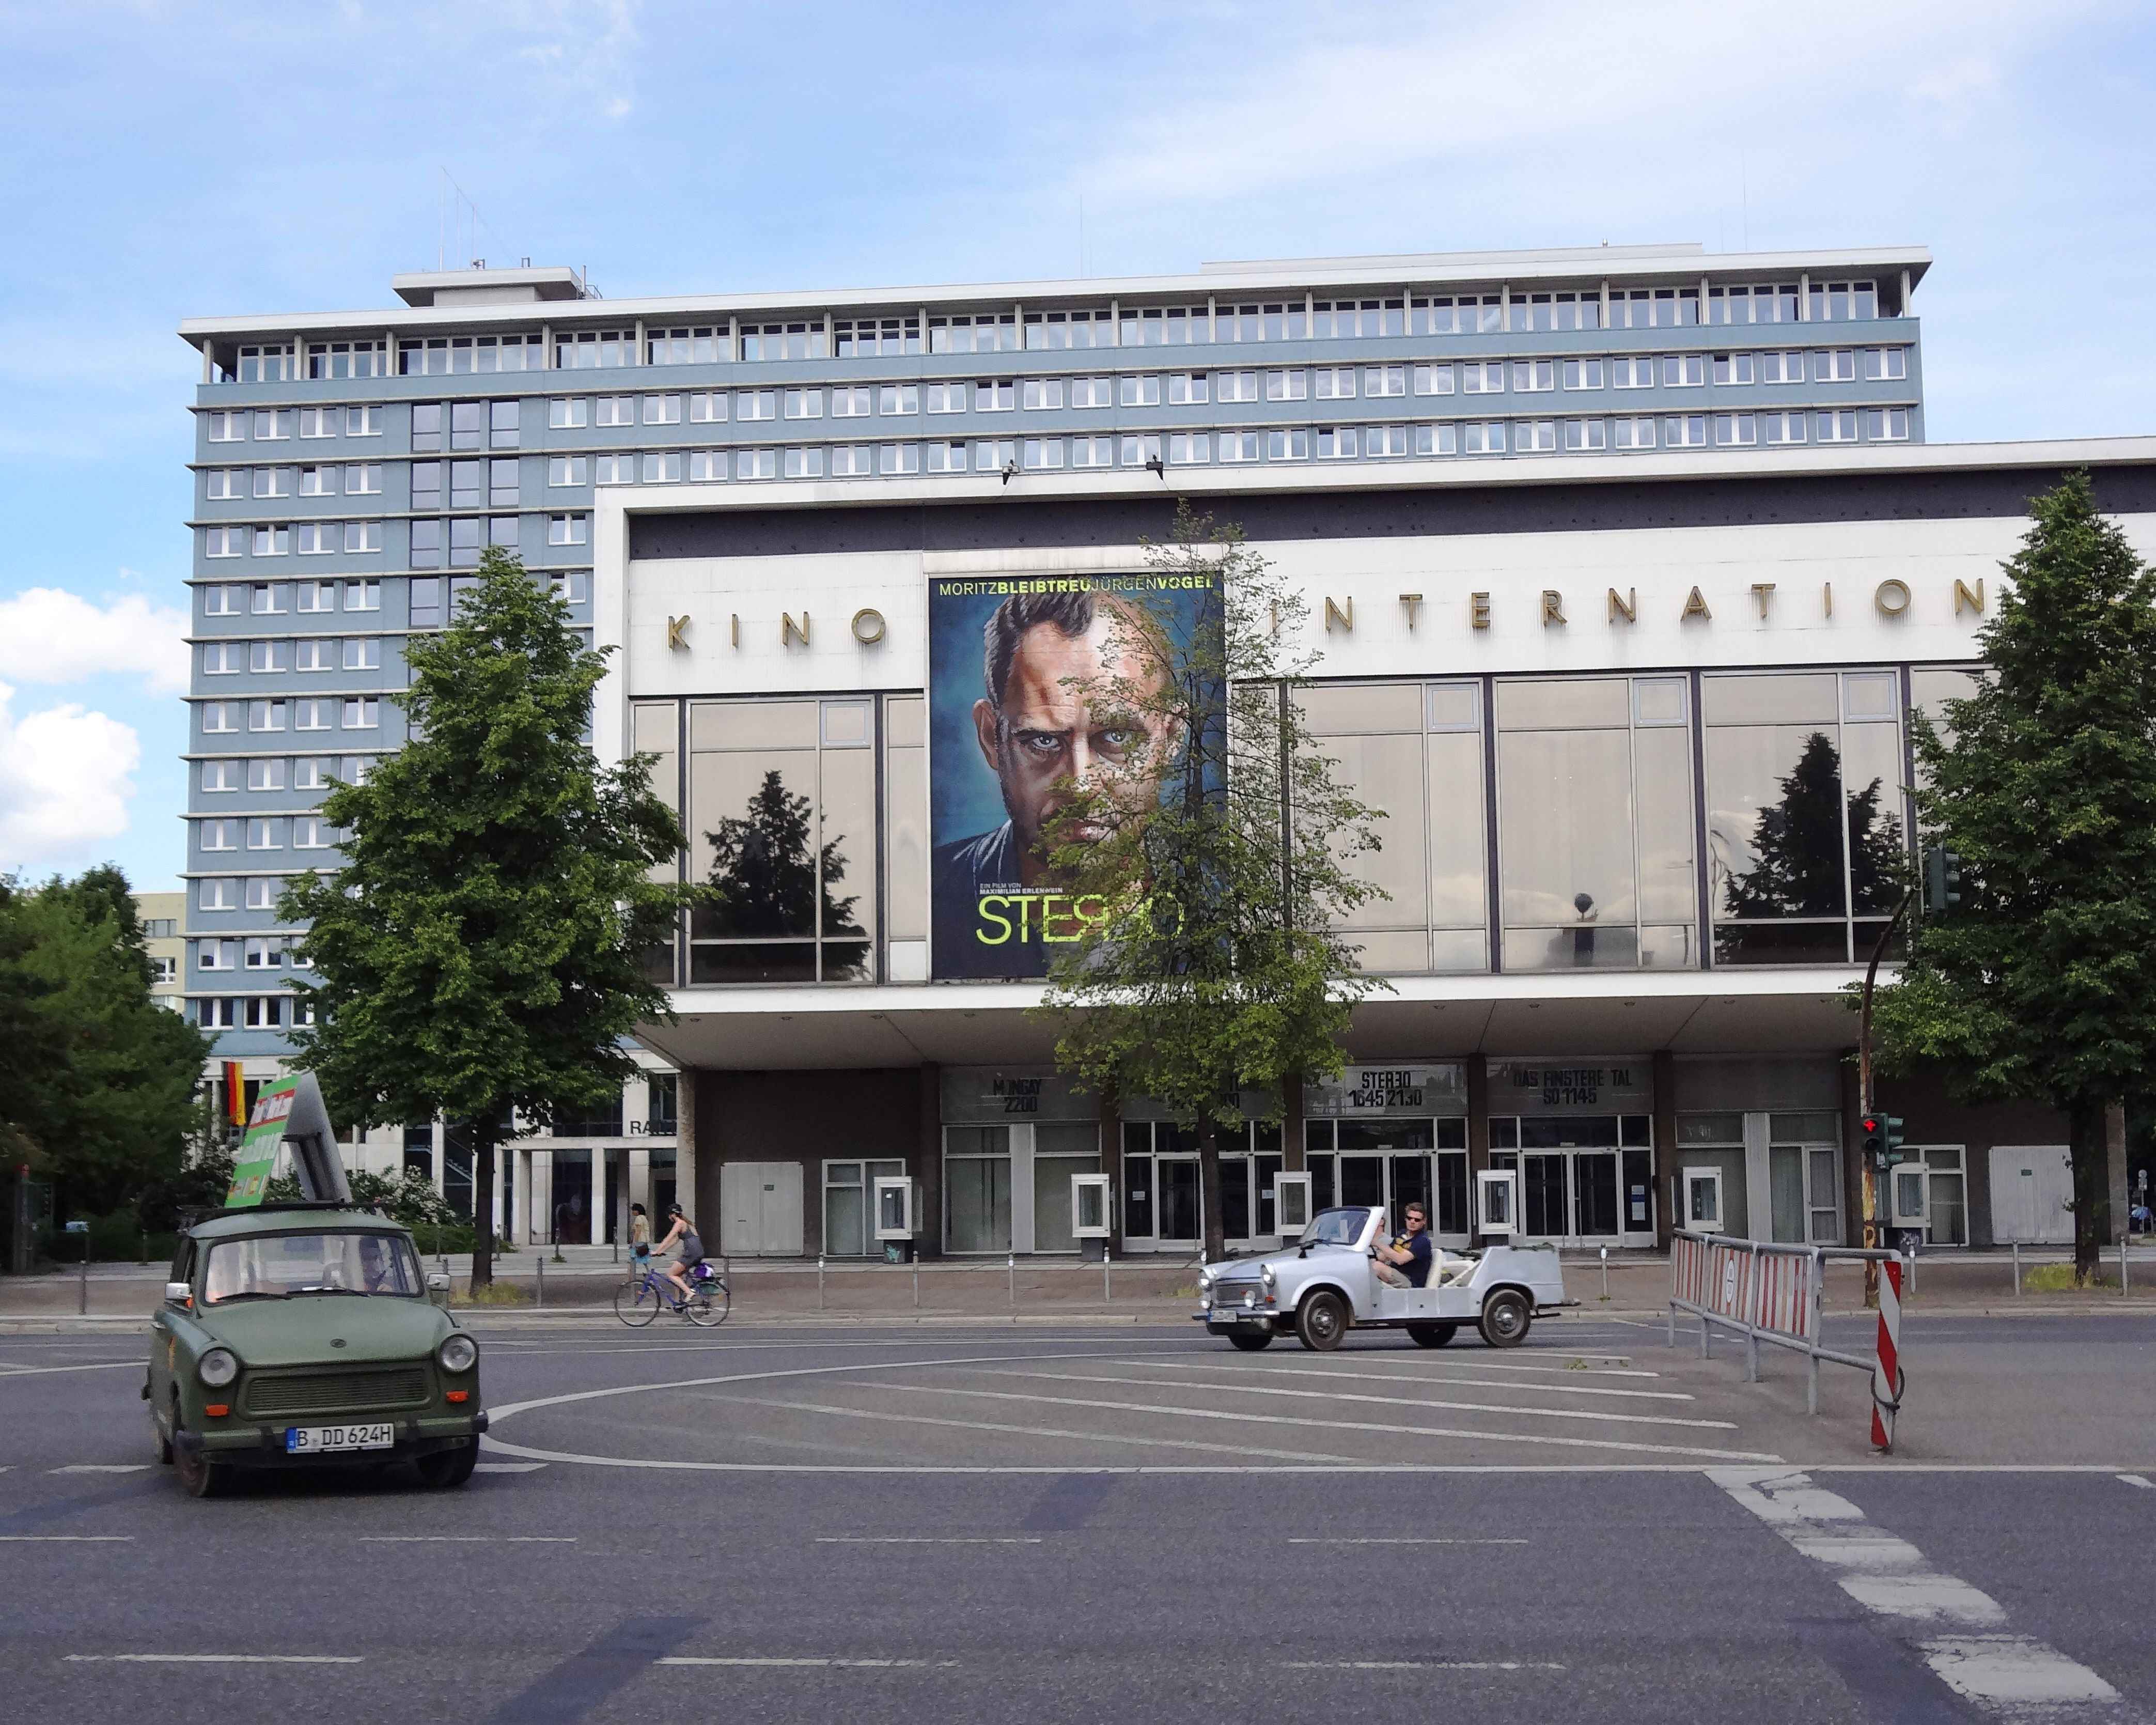 Berlin Kino International.jpg